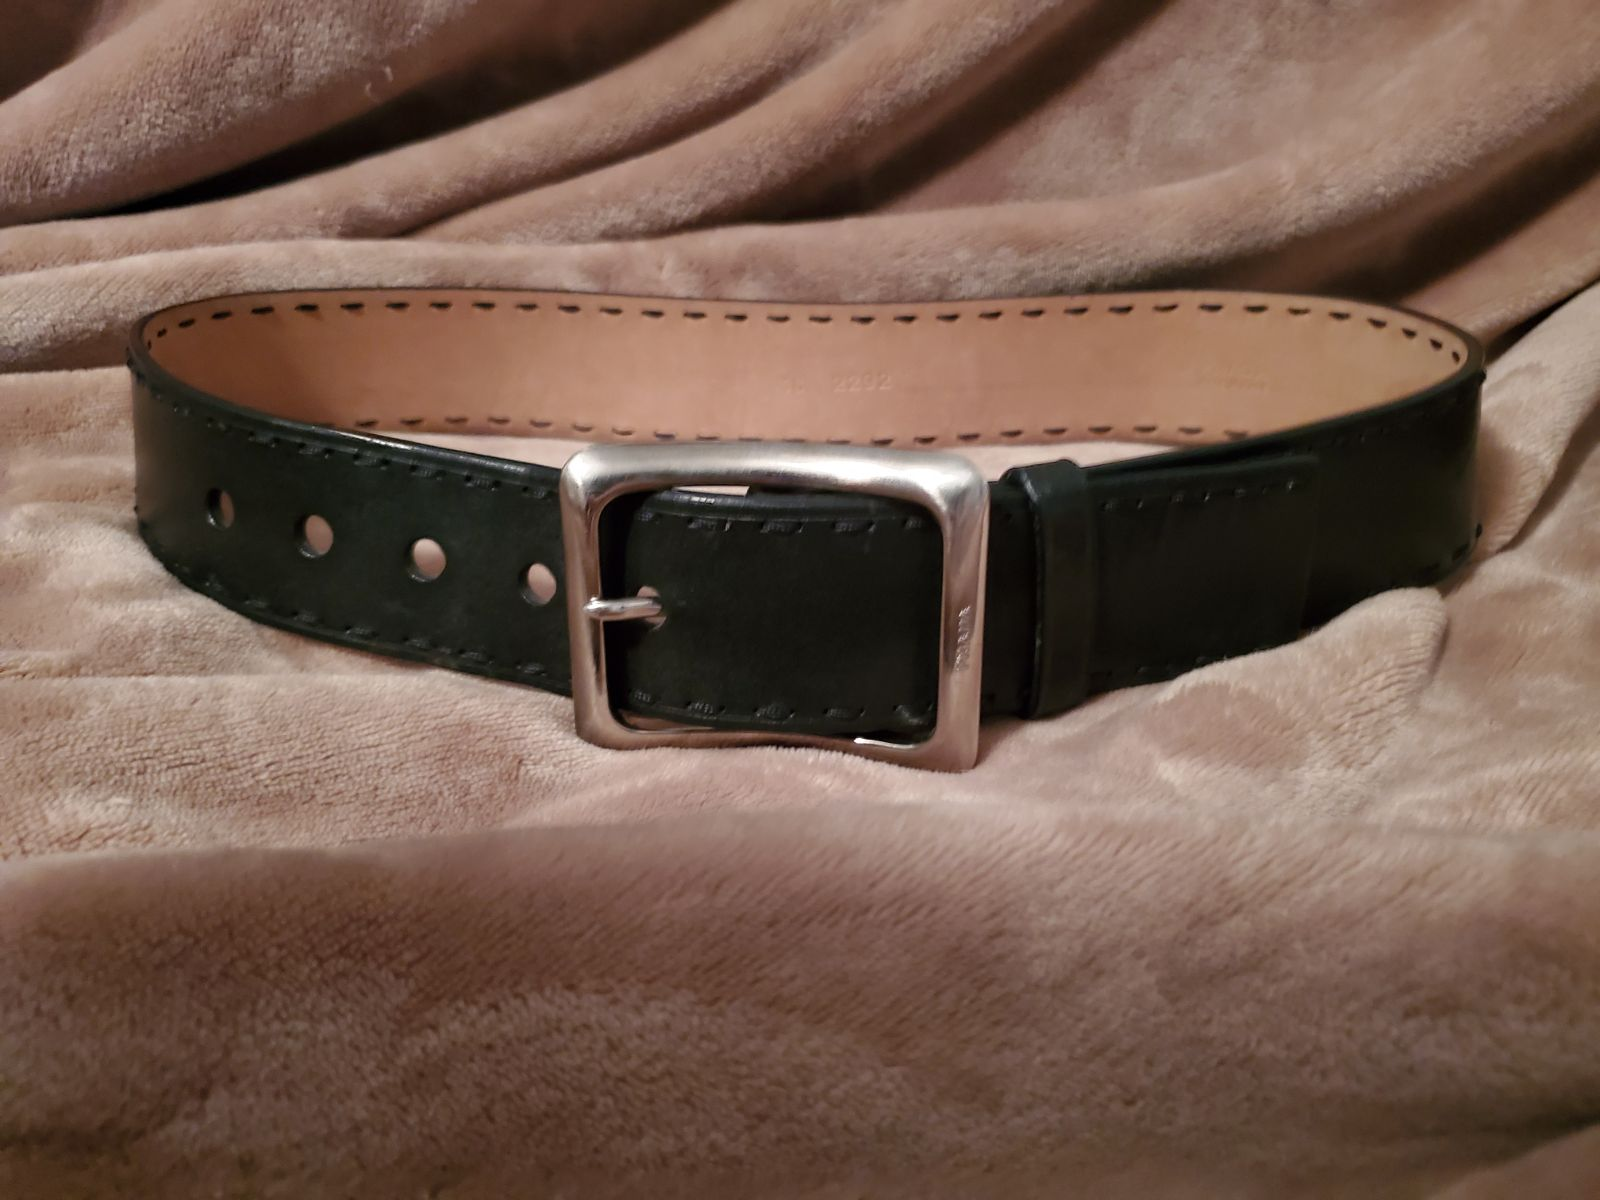 Prada designer Belt Black leather sz 30